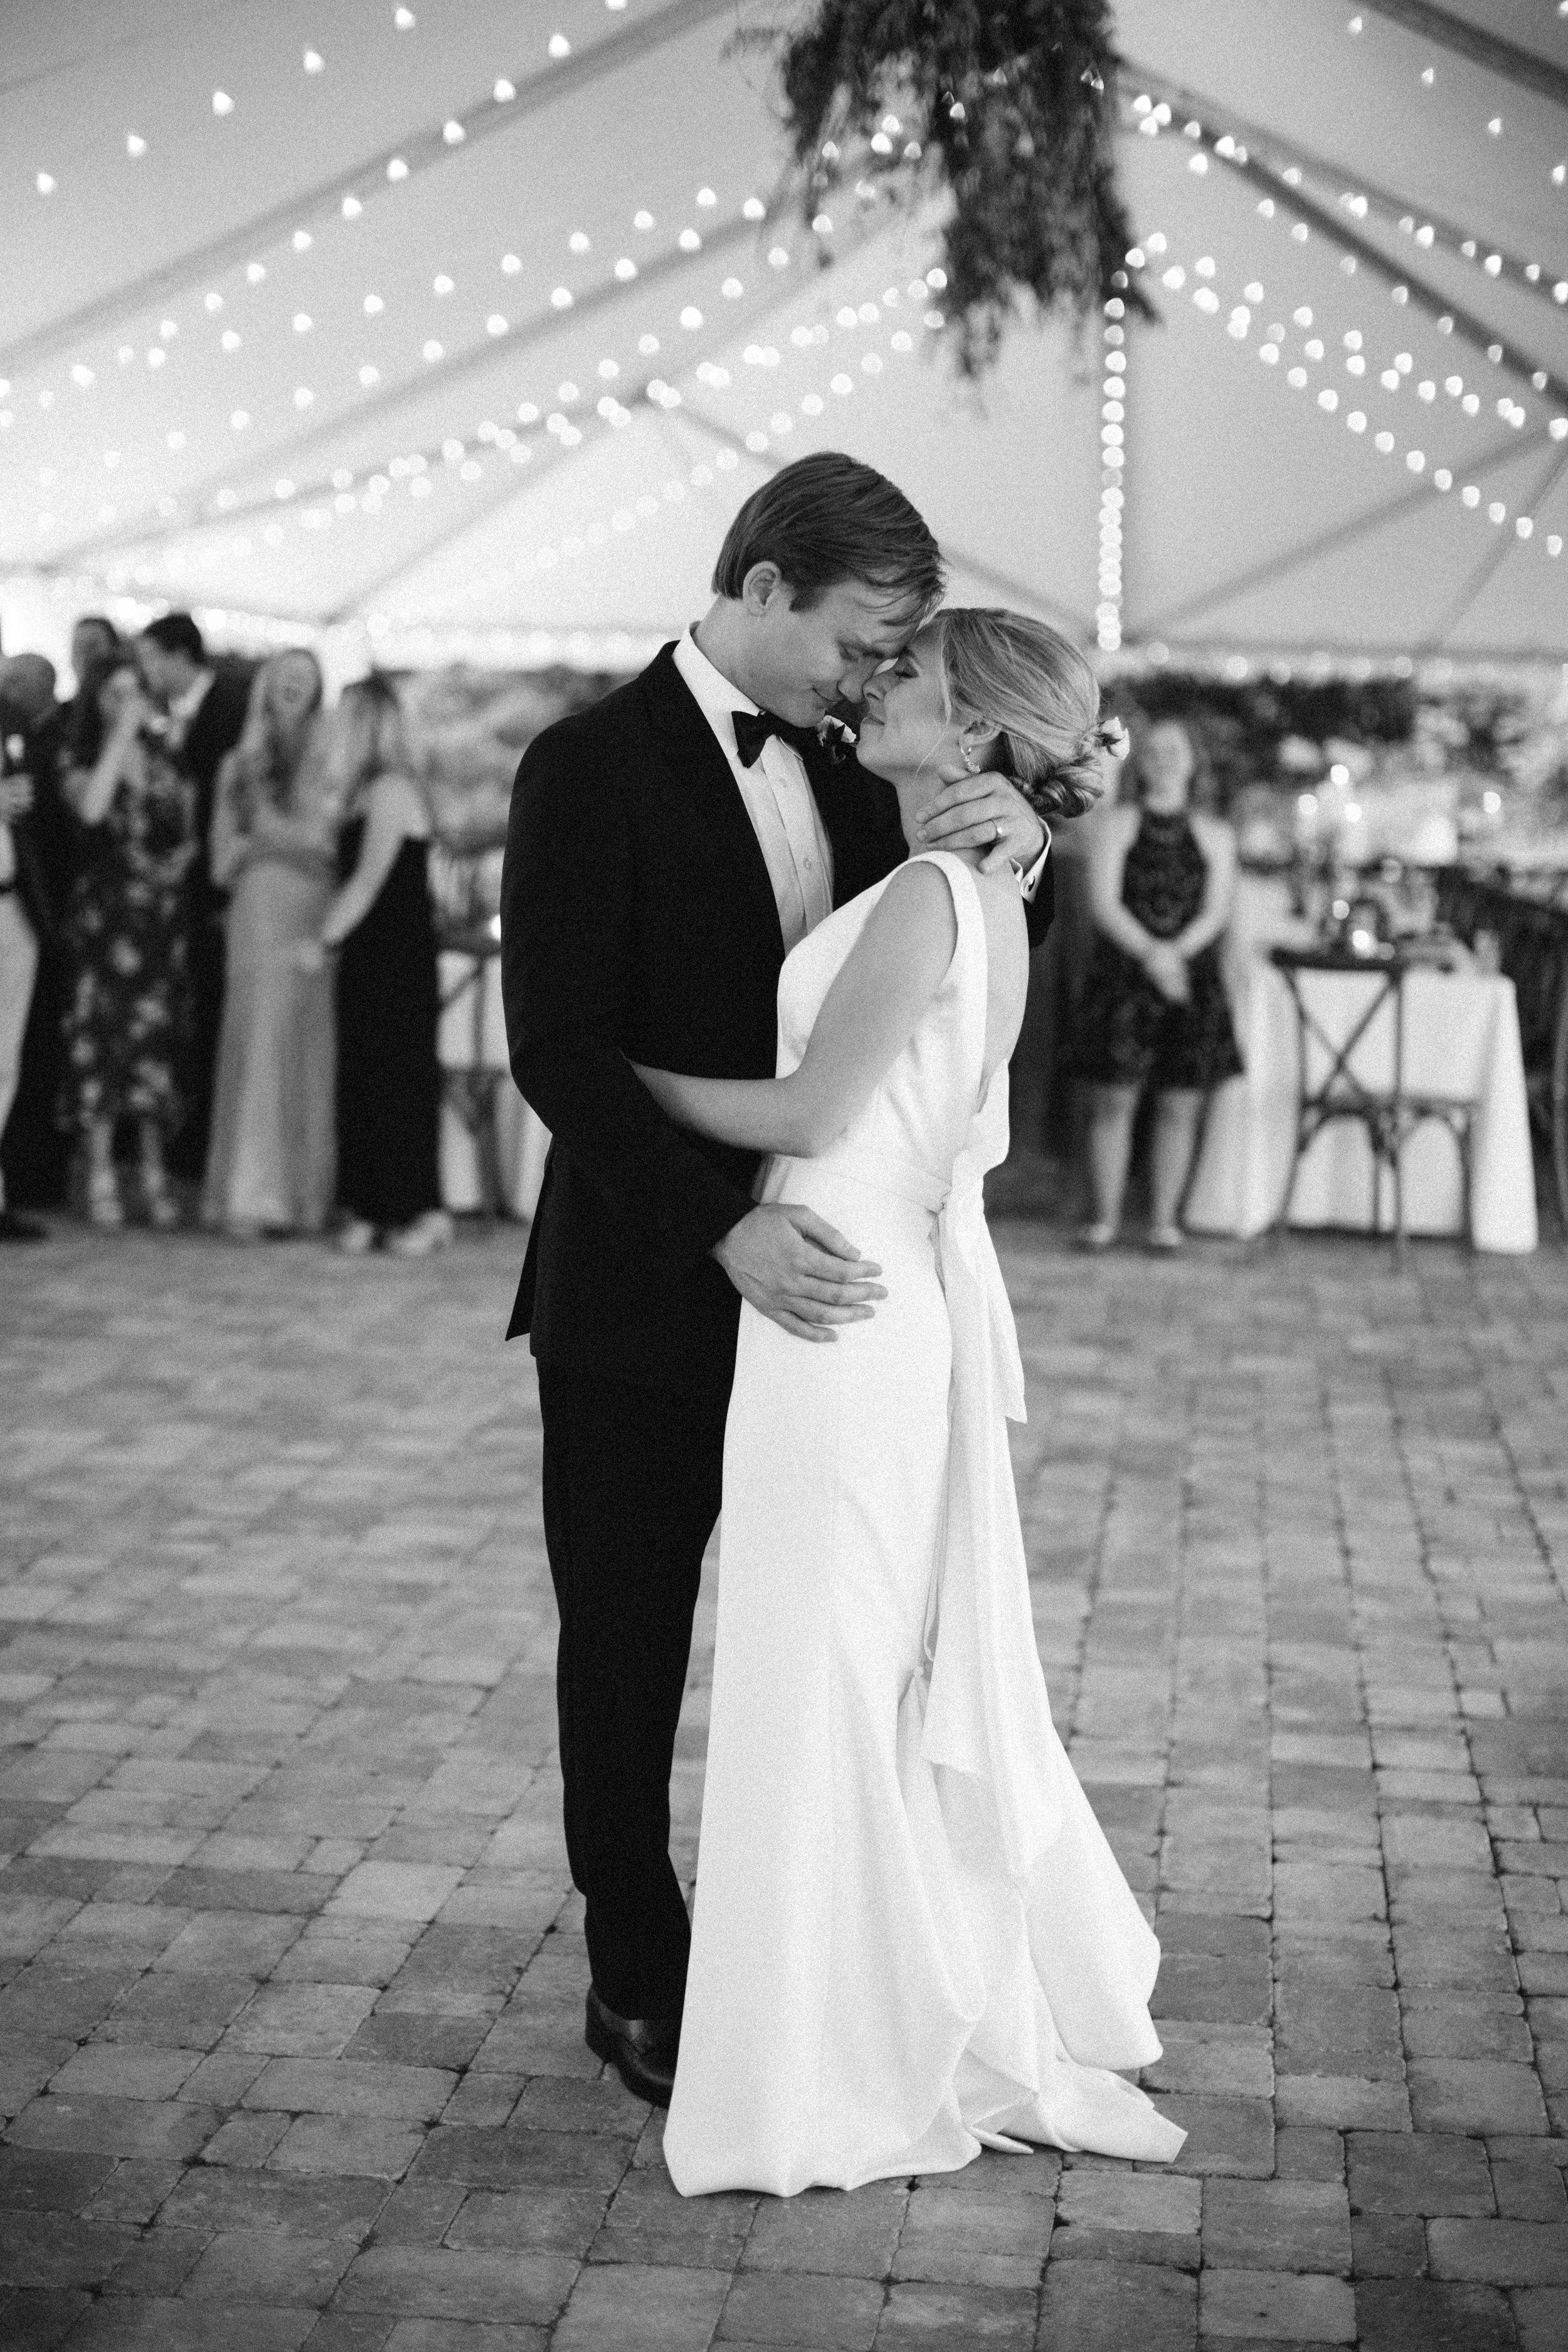 Olivia_Patrick_Wedding_Quarry_Venue_Abigail_Malone_Photography_Knoxville-762.jpg